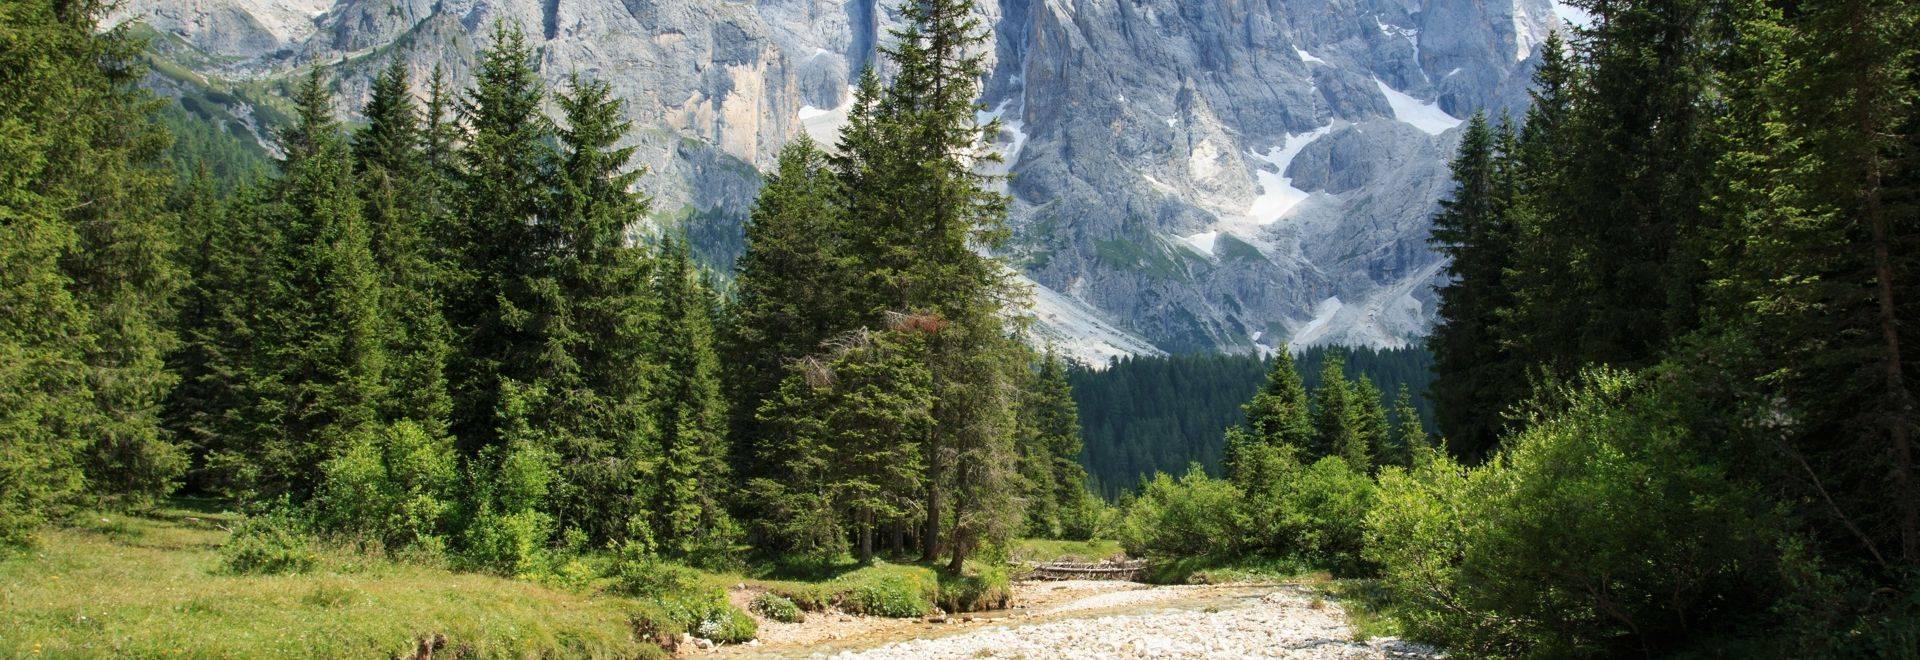 Val Venegia, Italian Dolomites shutterstock_625066994.jpg